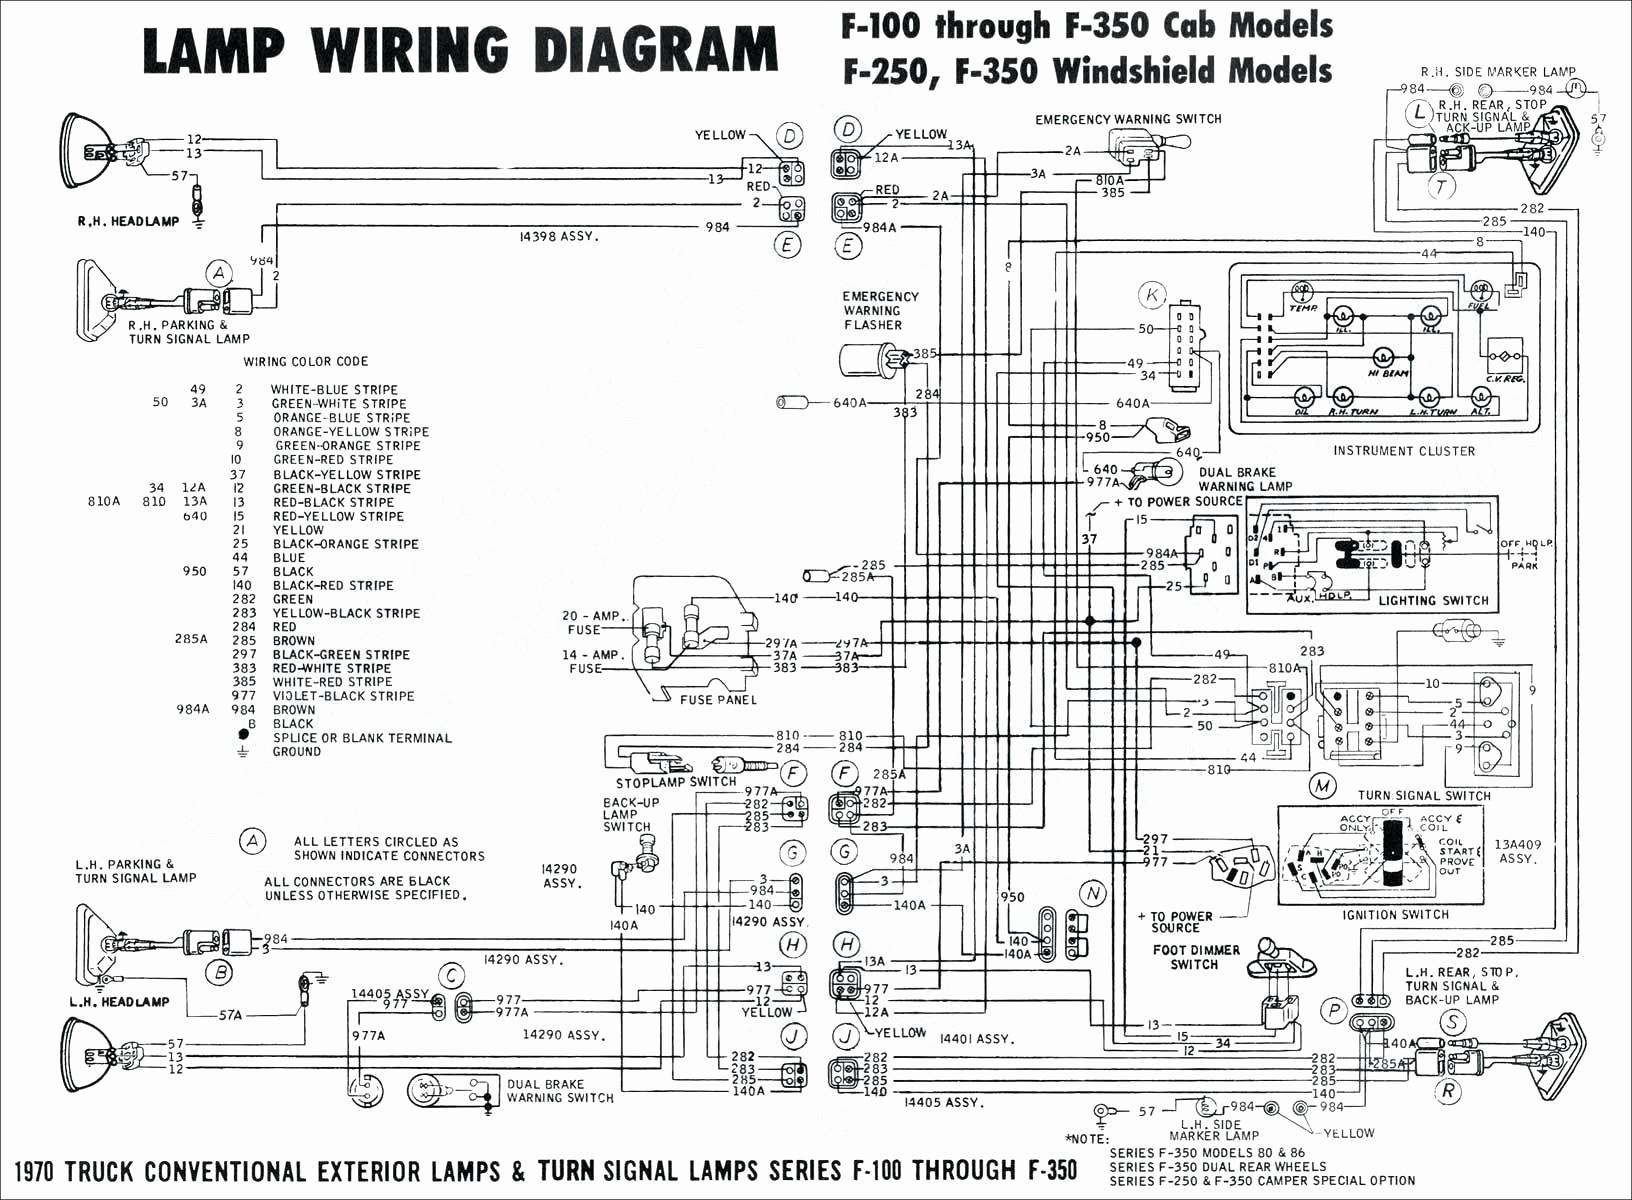 2001 S10 Rear Lights Wiring Diagram. chevrolet s-10